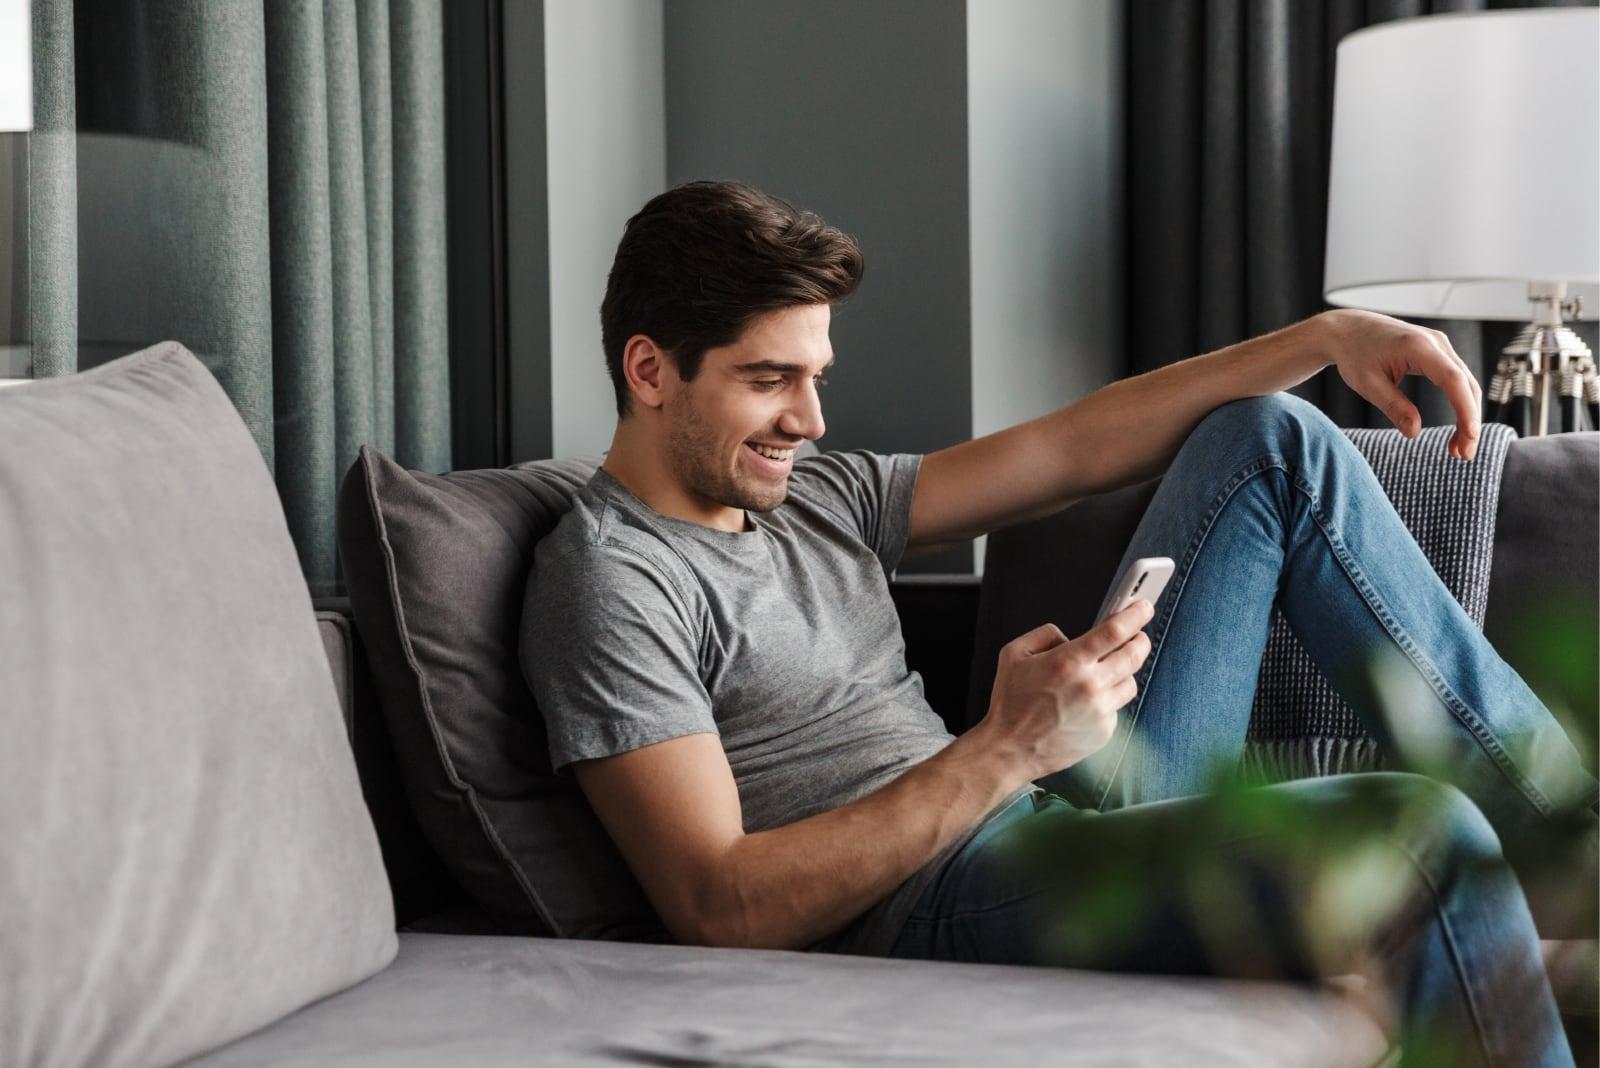 man using smartphone while sitting on sofa